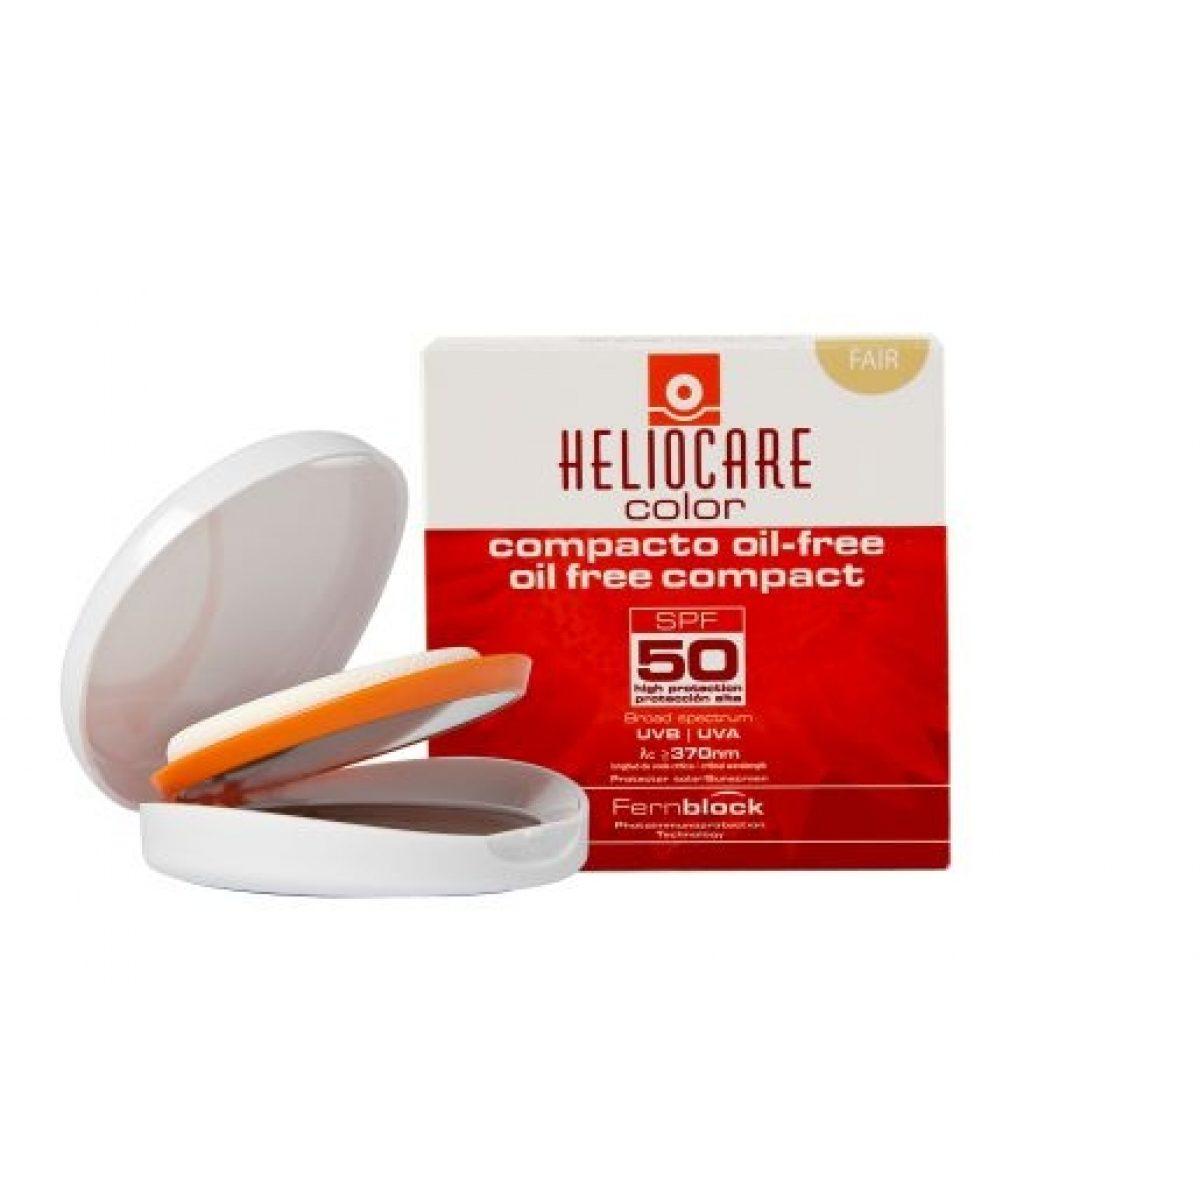 HELIOCARE COLOR COMPACT OIL-FREE FAIR SPF50